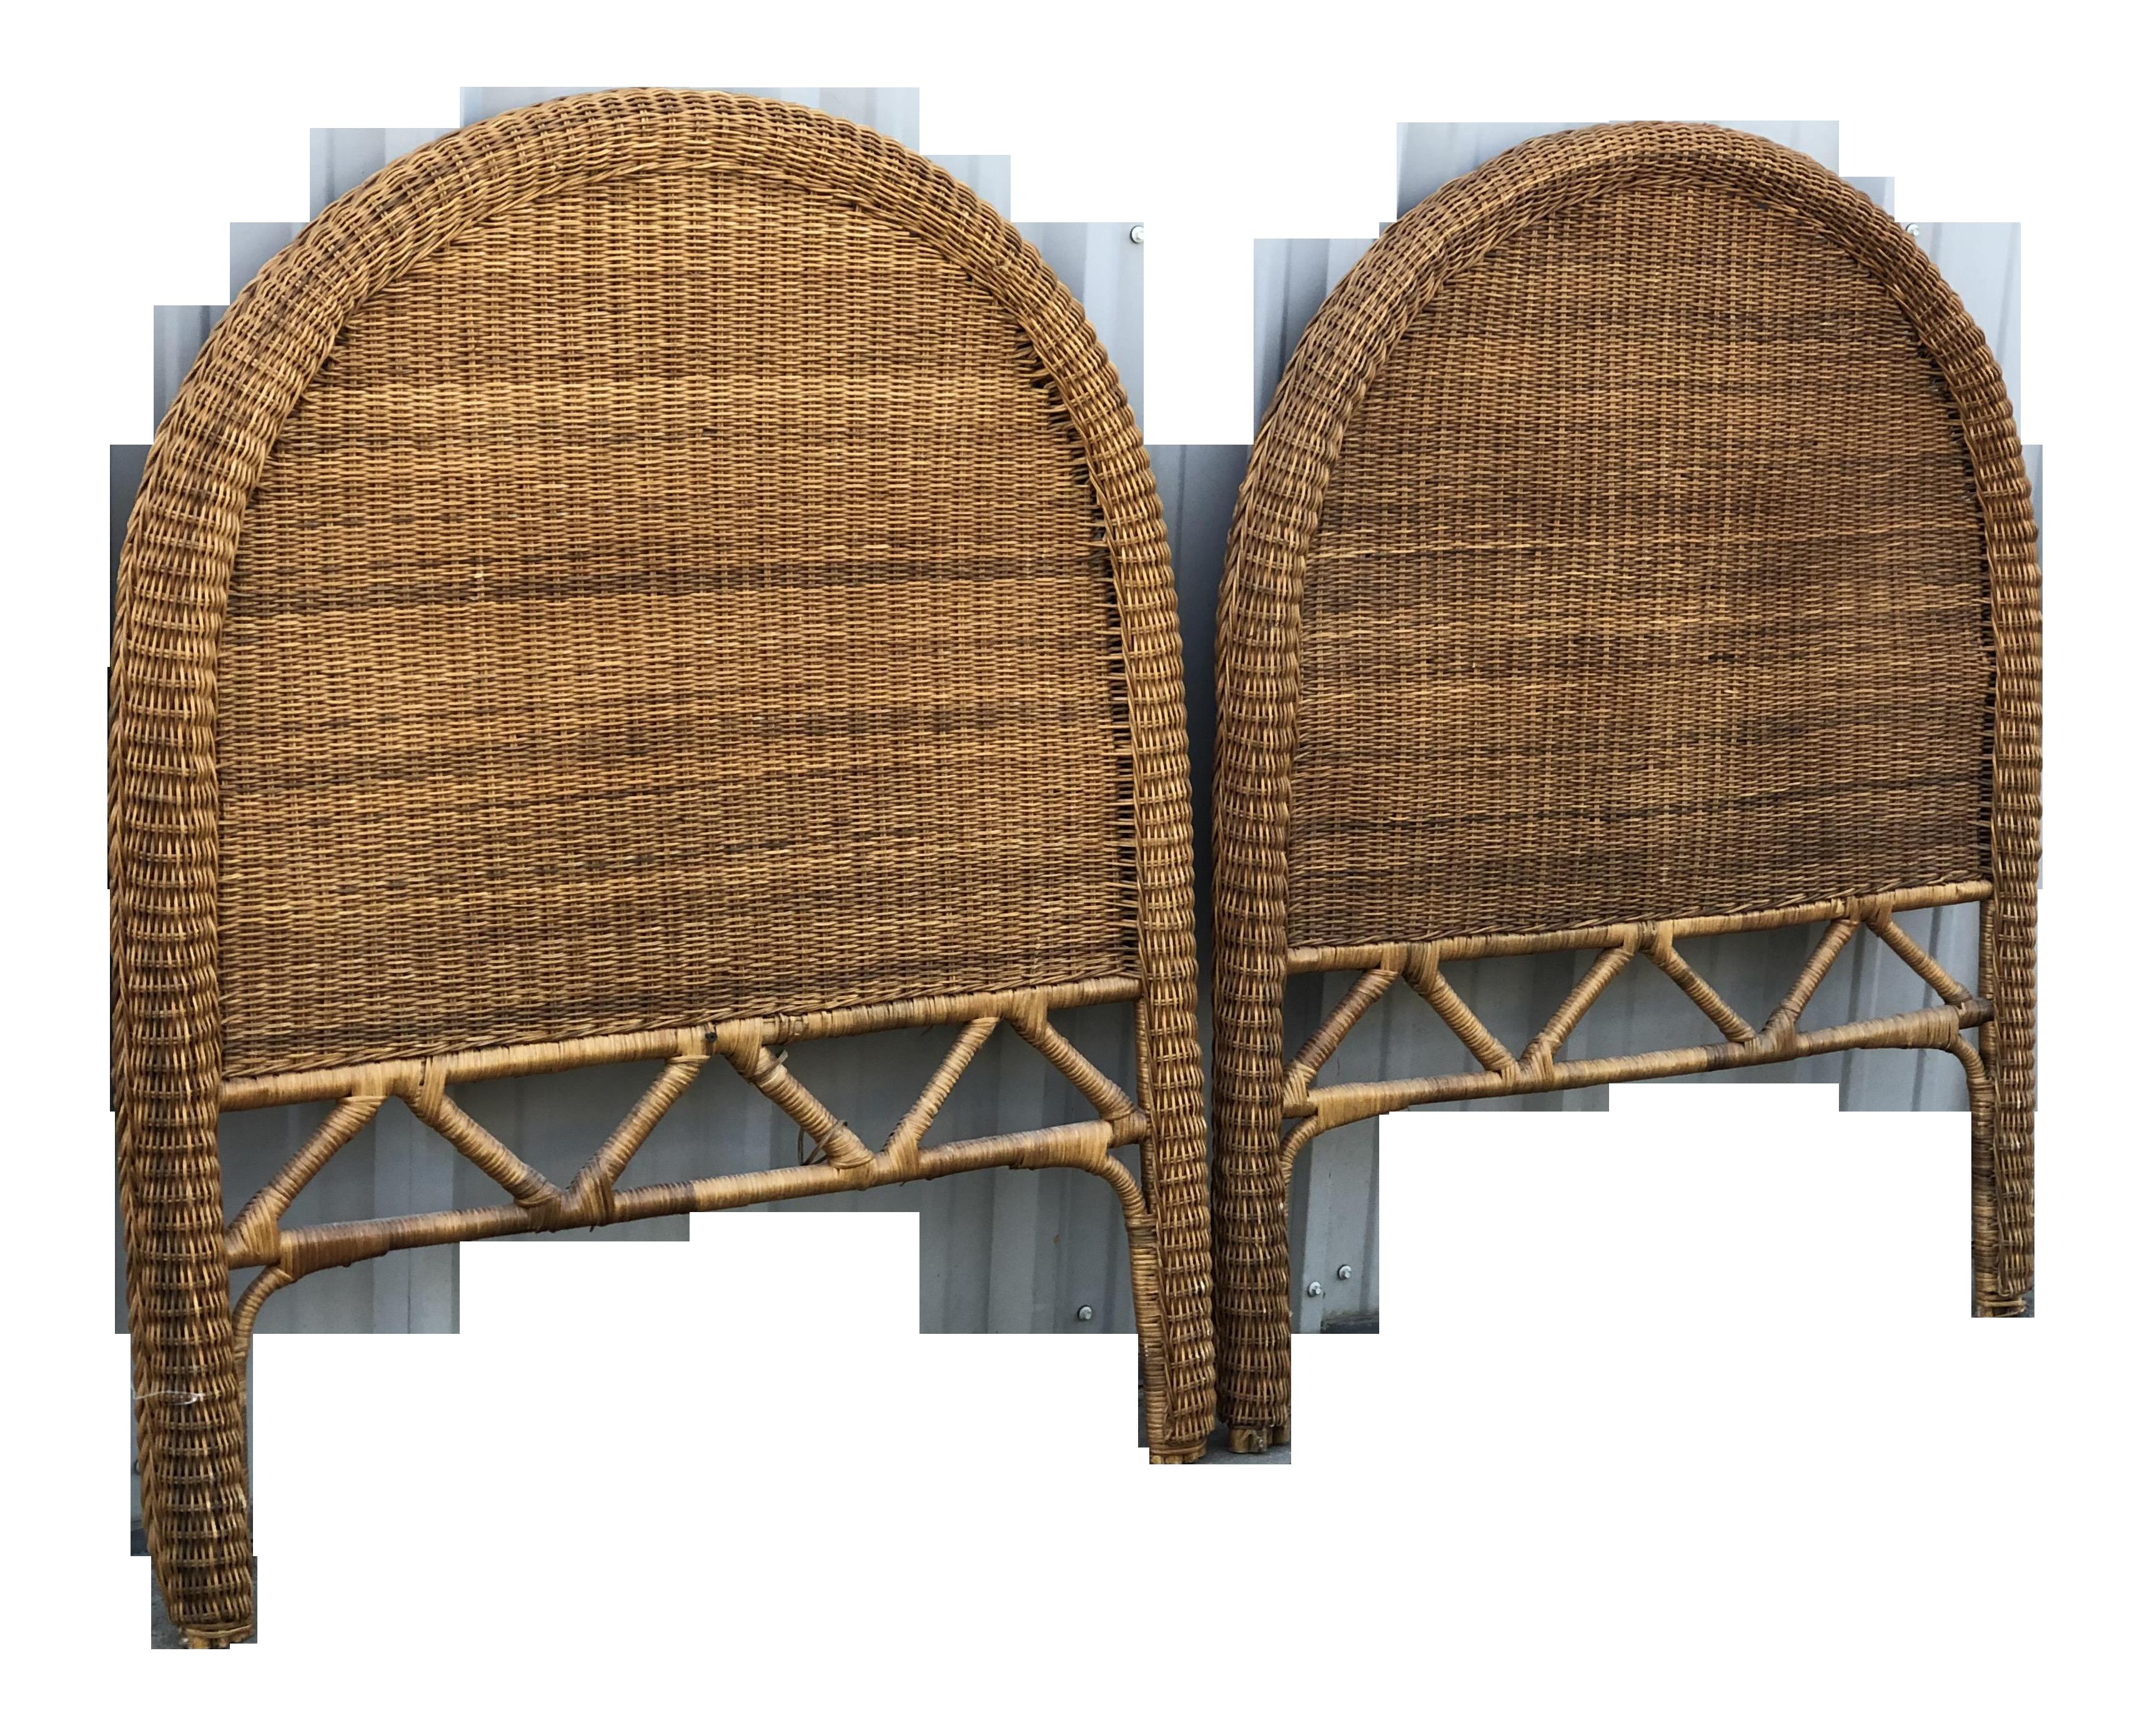 Vintage Boho Chic Rattan Twin Headboards   a Pair on Chairish.com ...